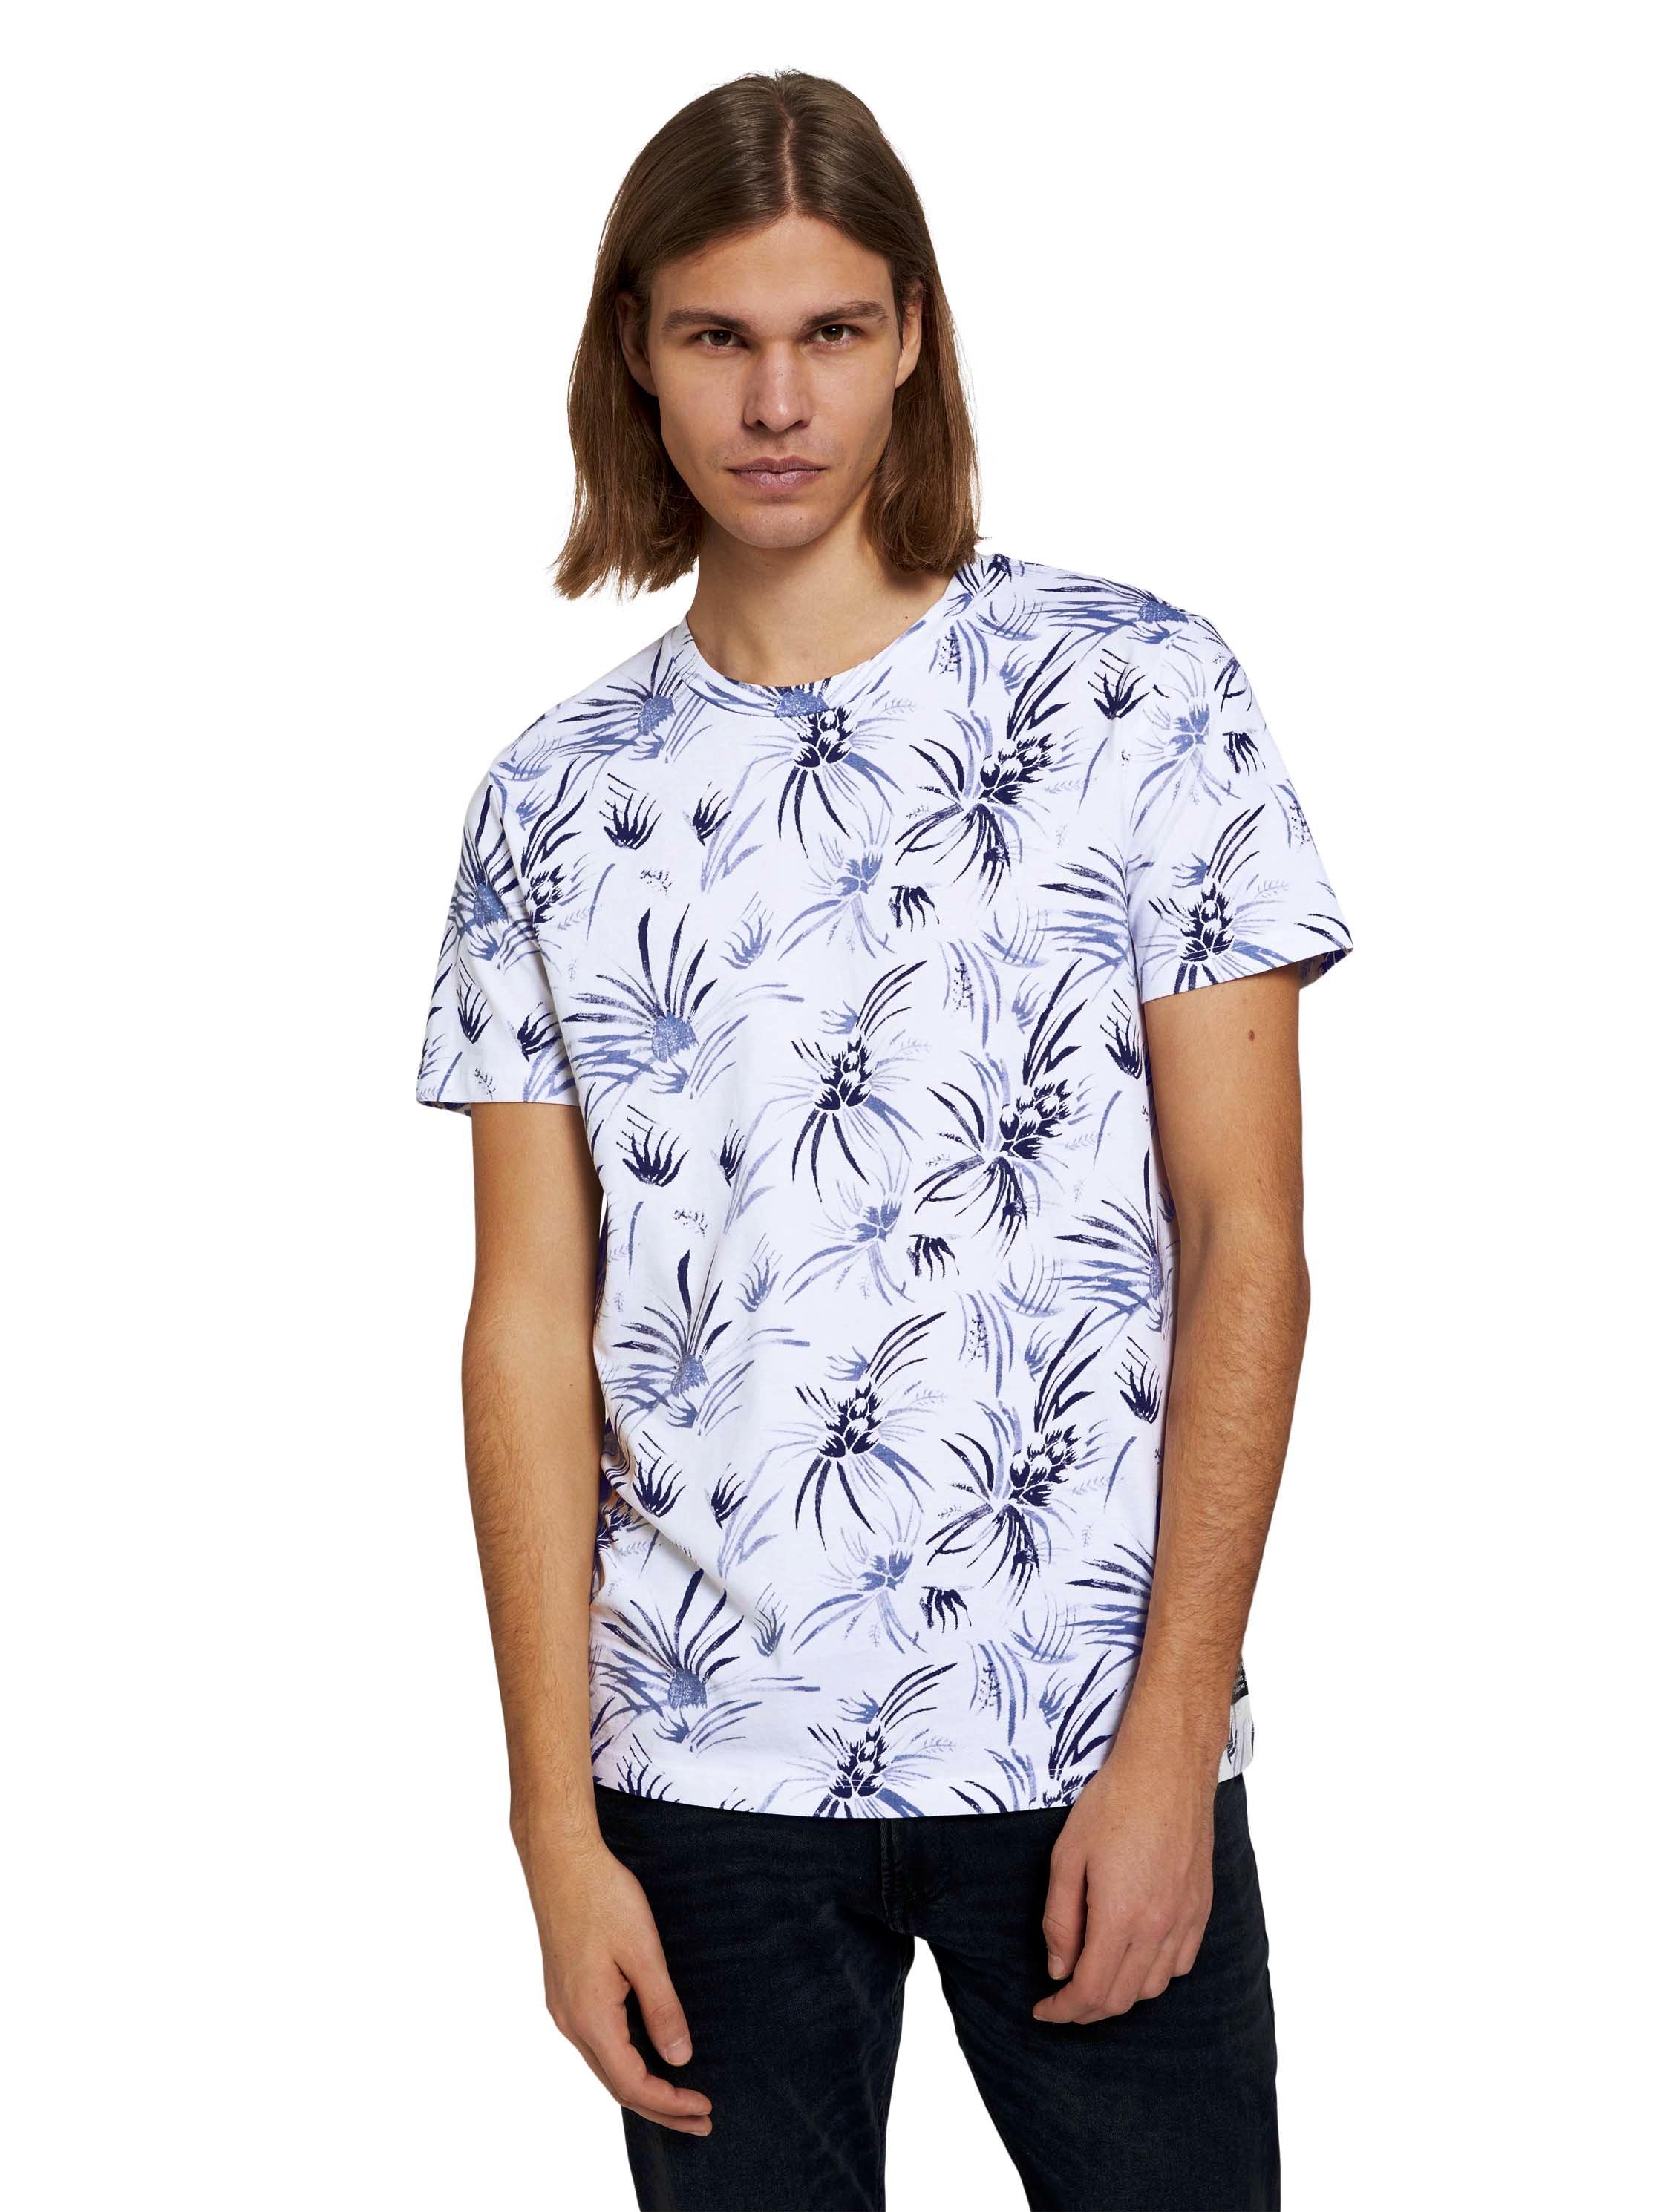 Tom Tailor Denim T-shirt alloverprinted